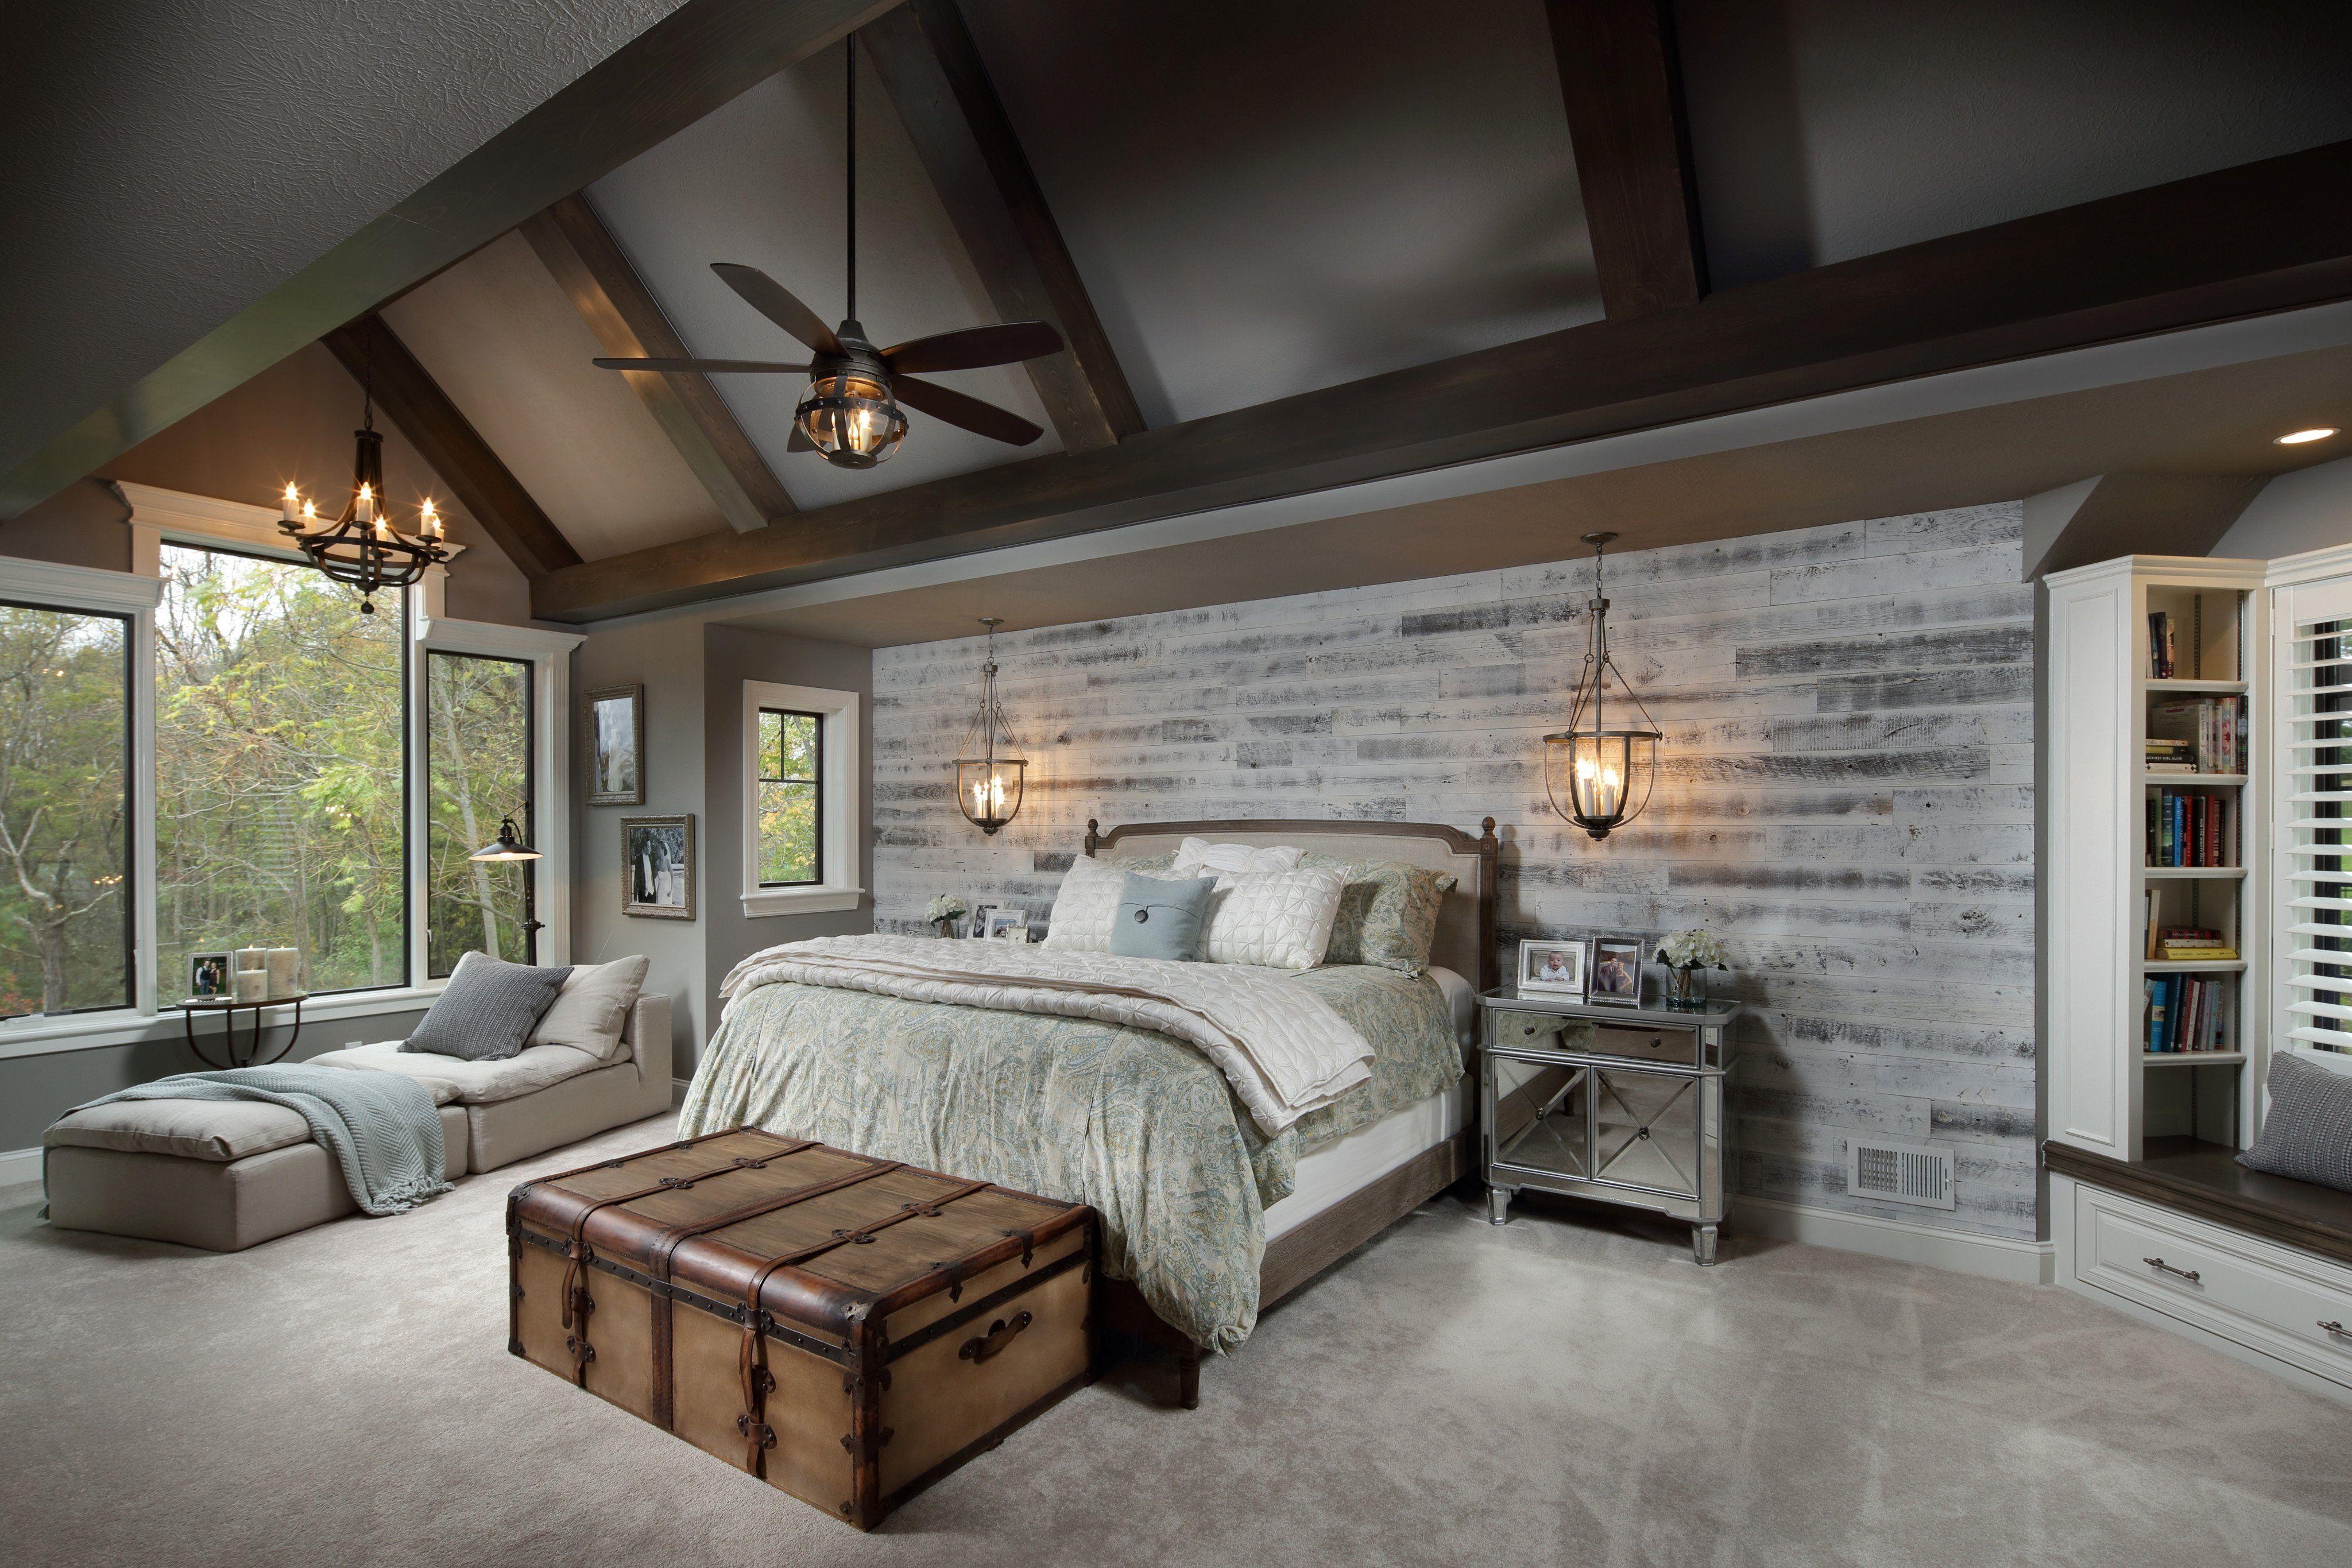 7 bold bedroom ideas farmhouse master bedroom modern on accent wall ideas id=44801